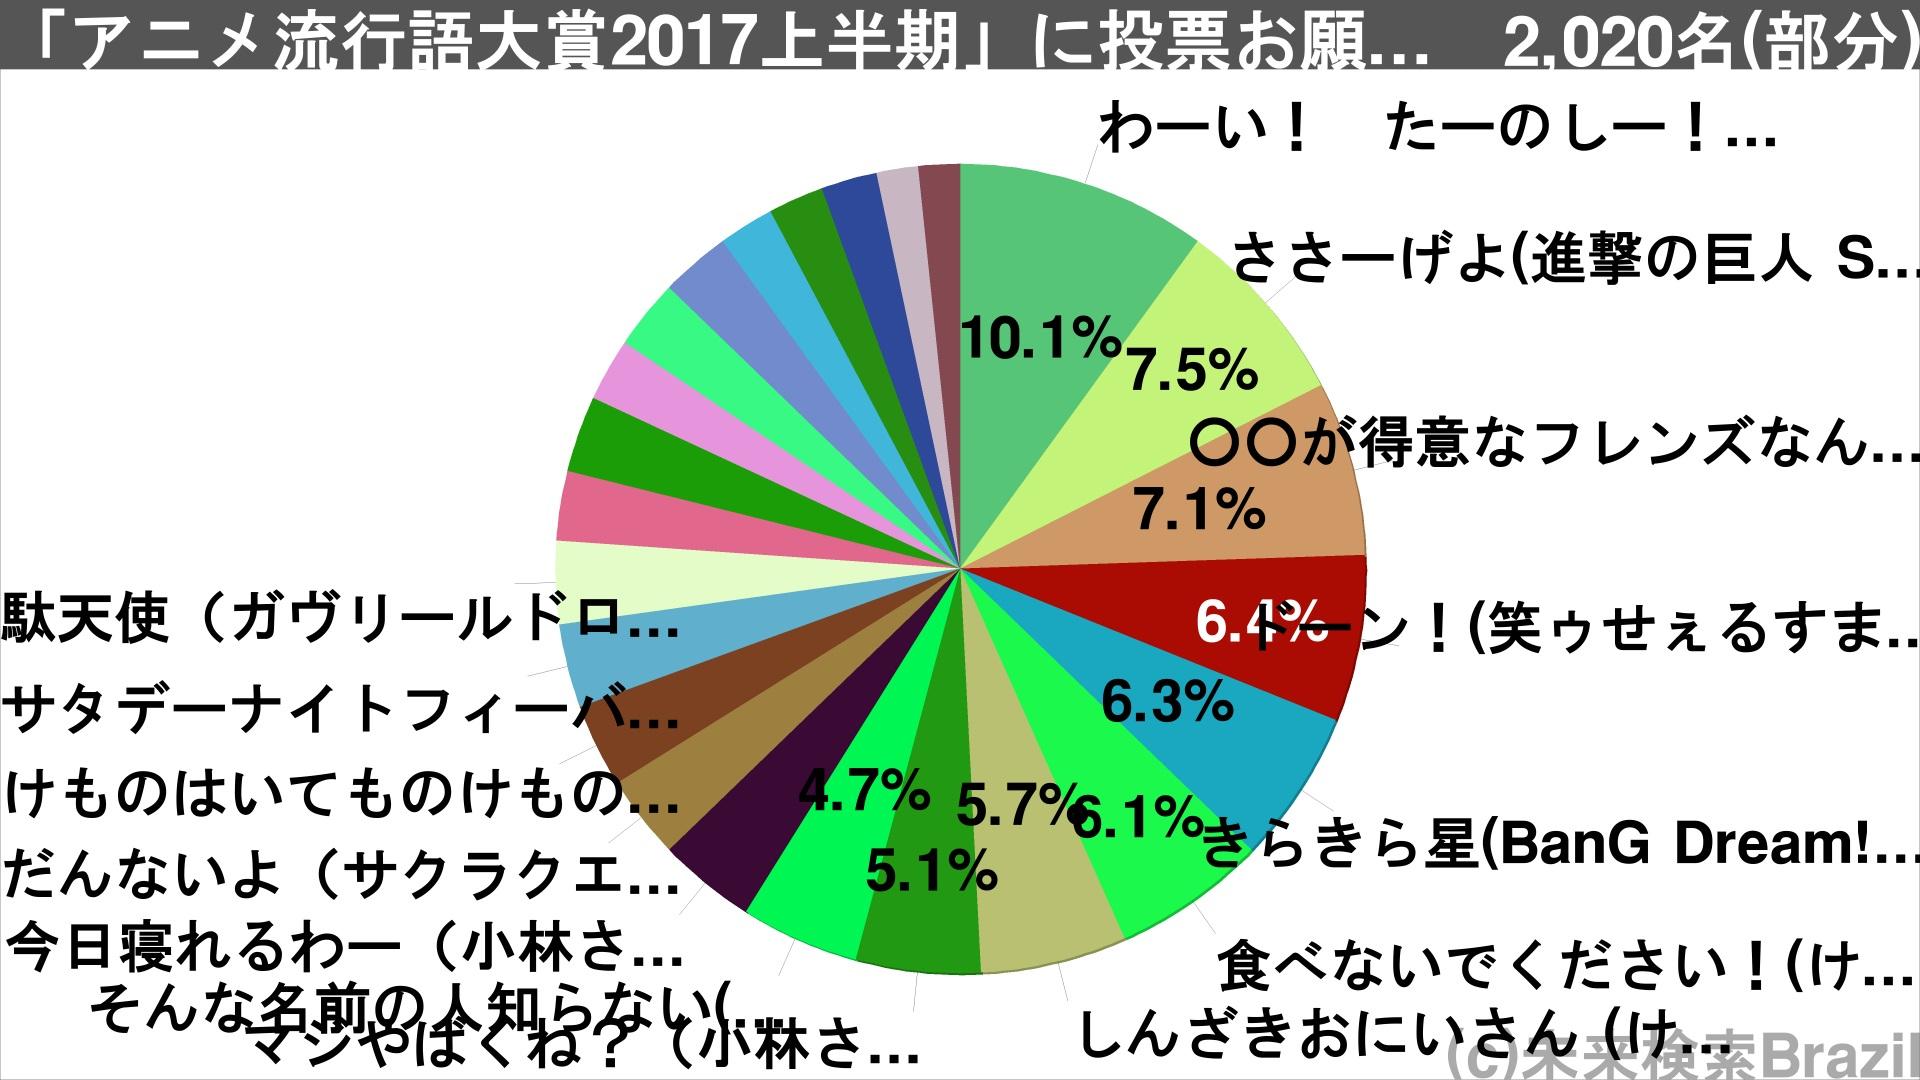 %e3%82%a2%e3%83%8b%e3%83%a12017%e4%b8%8a%e5%8d%8a%e6%9c%9f